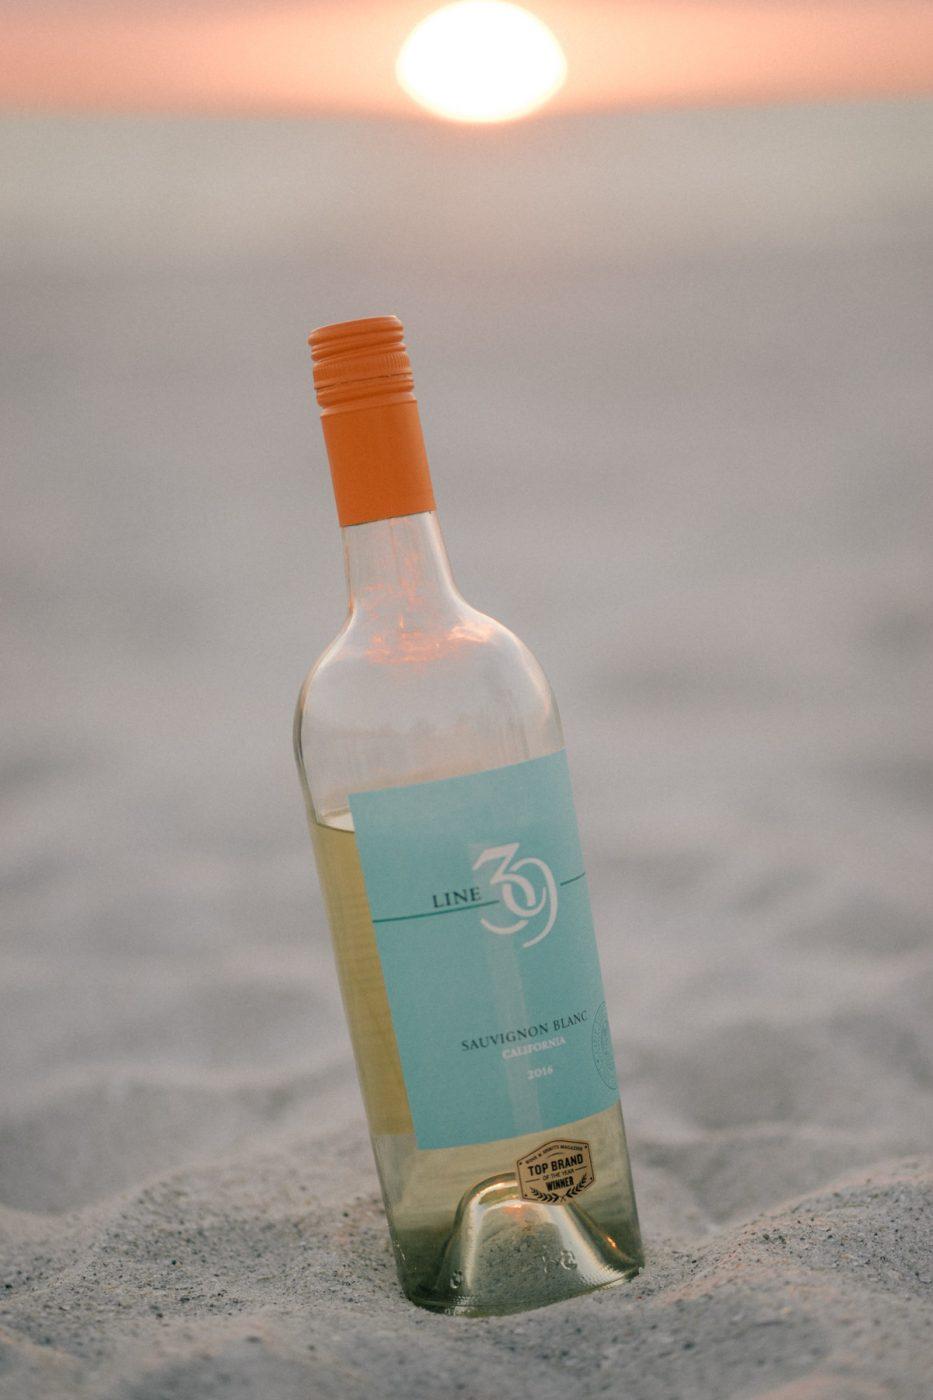 Line 39 Sauvignon Blanc - Sweet Teal